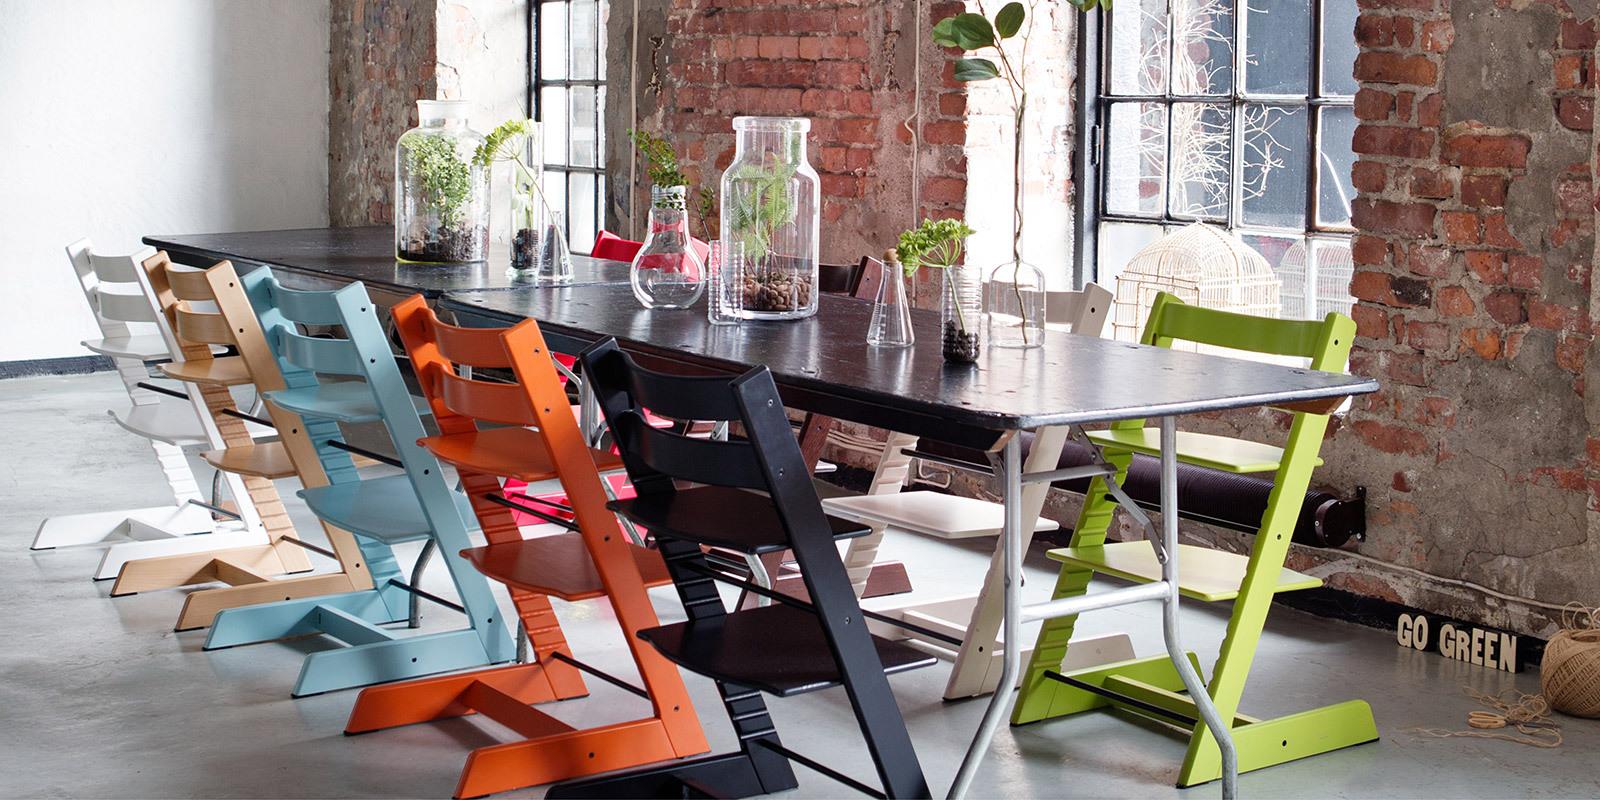 tripp trapp chair natural. Black Bedroom Furniture Sets. Home Design Ideas